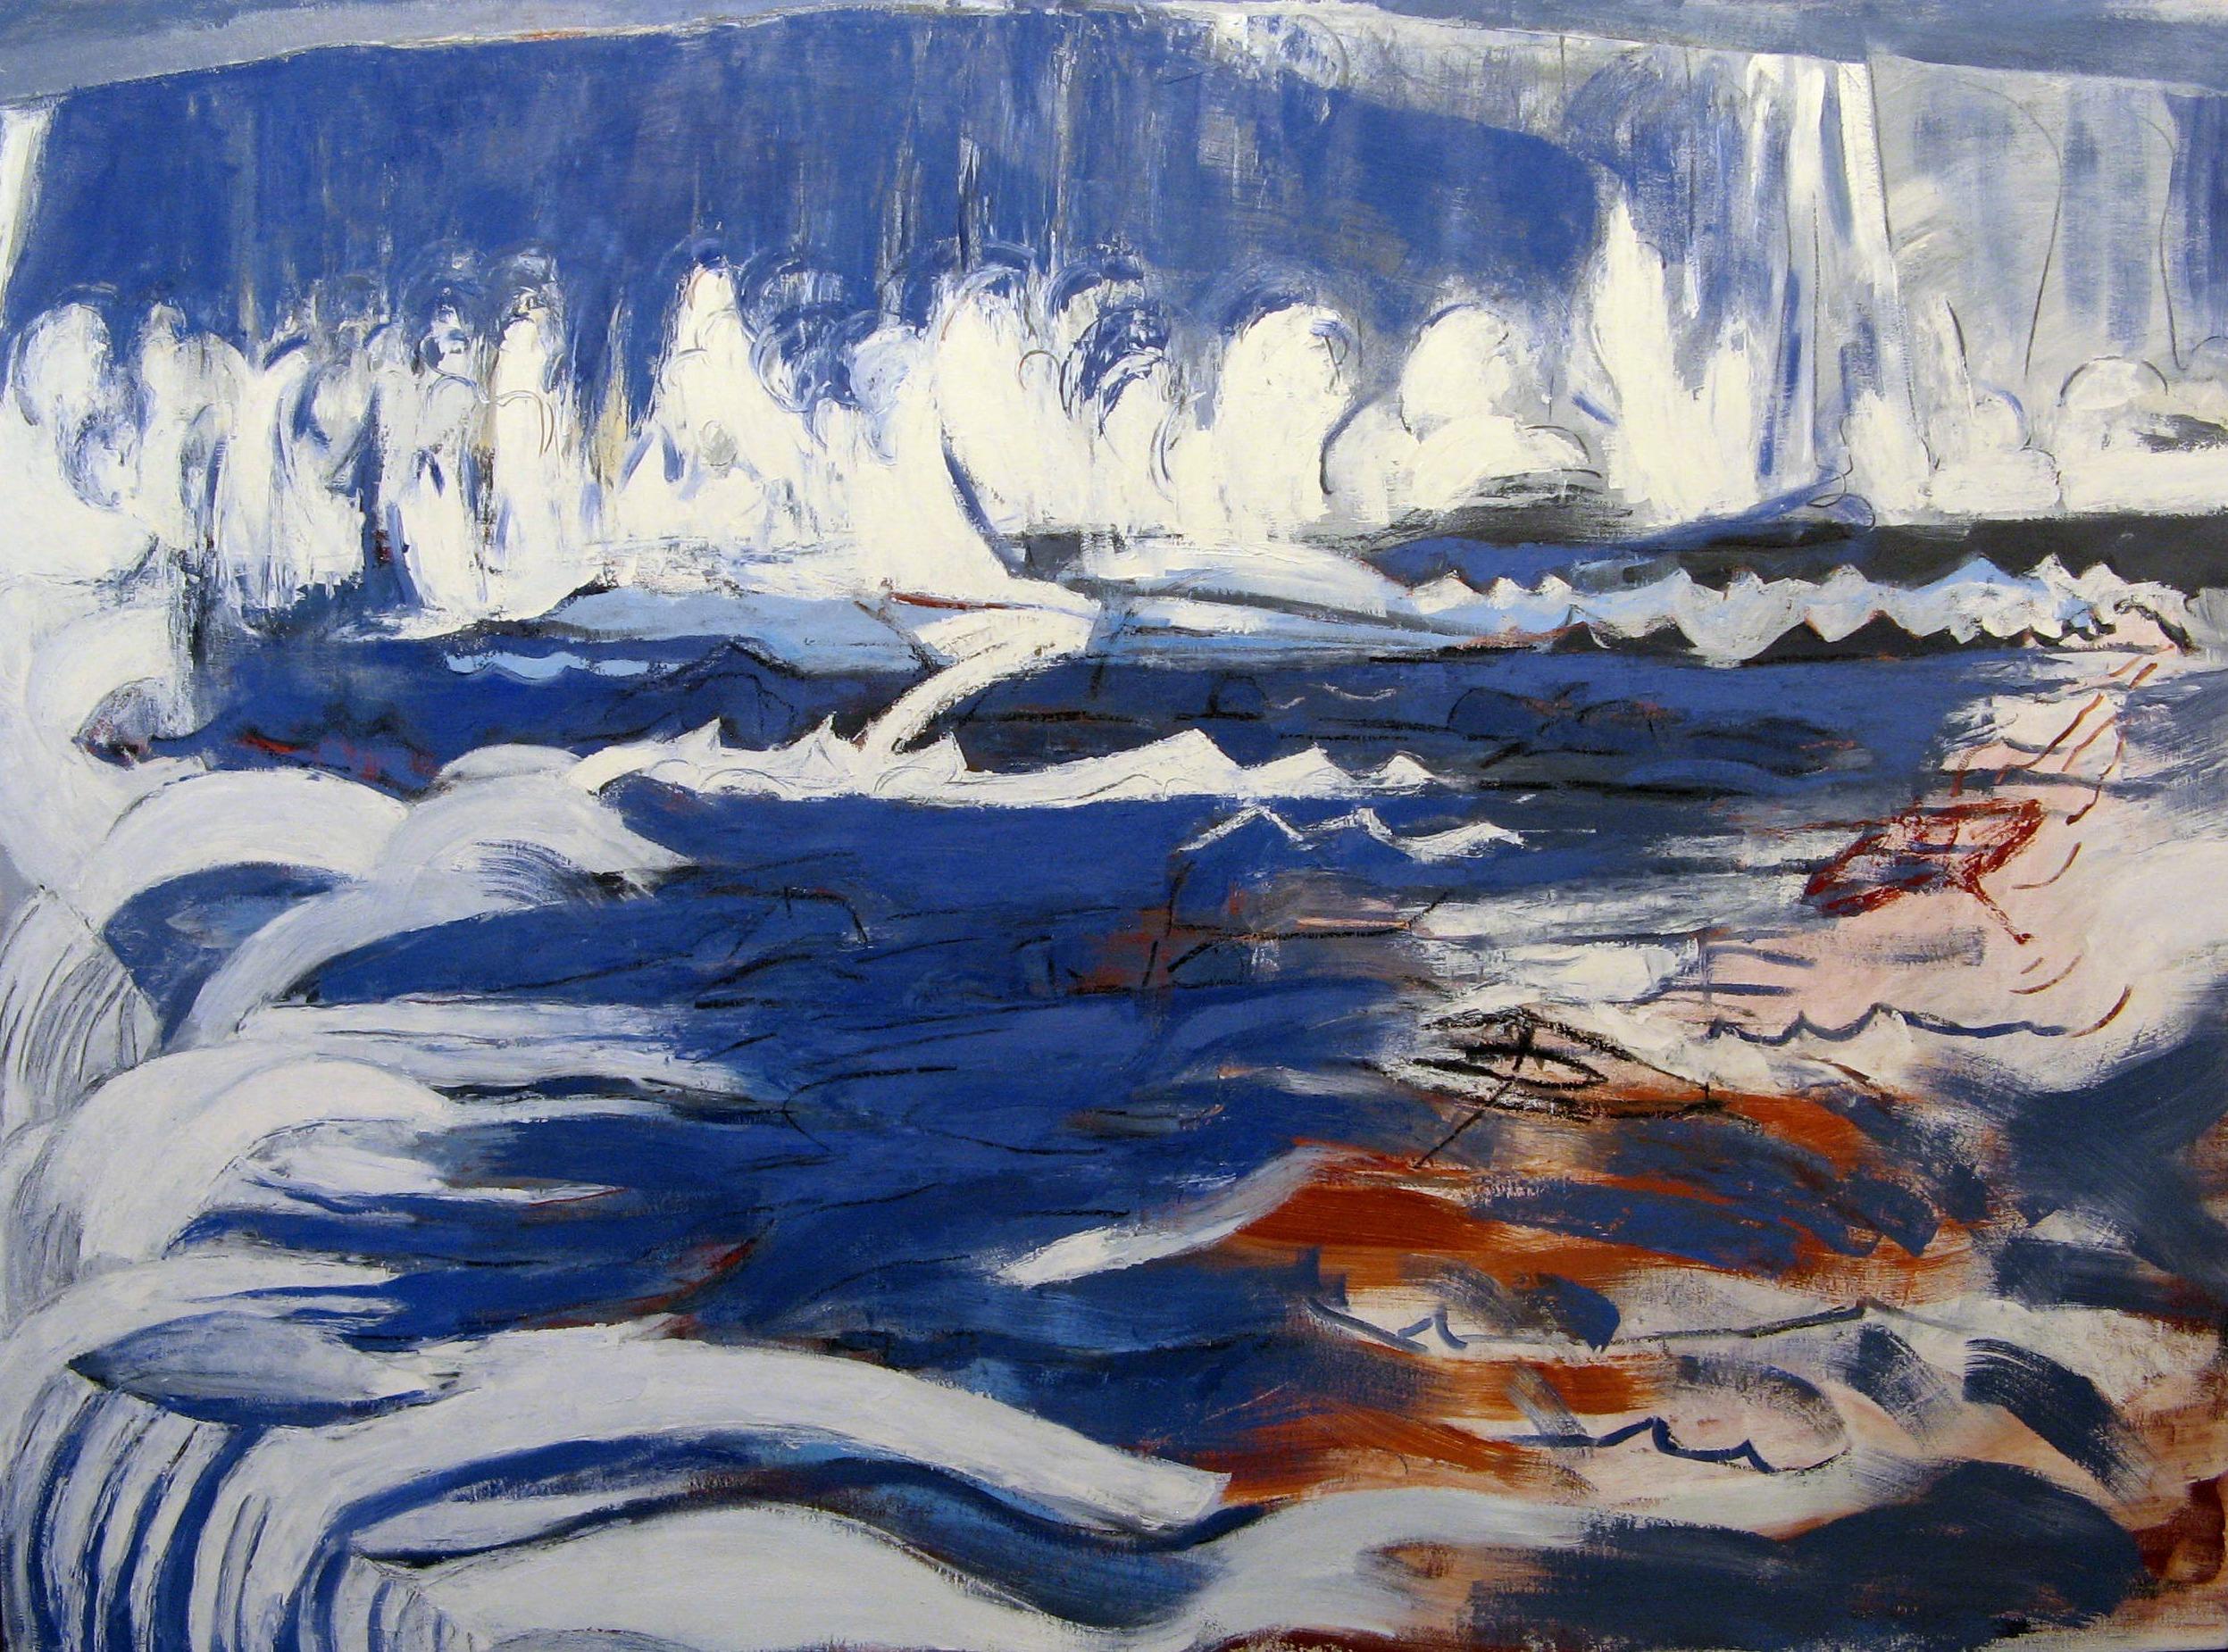 Osterman,  Falls  Oil on canvas, 42x56